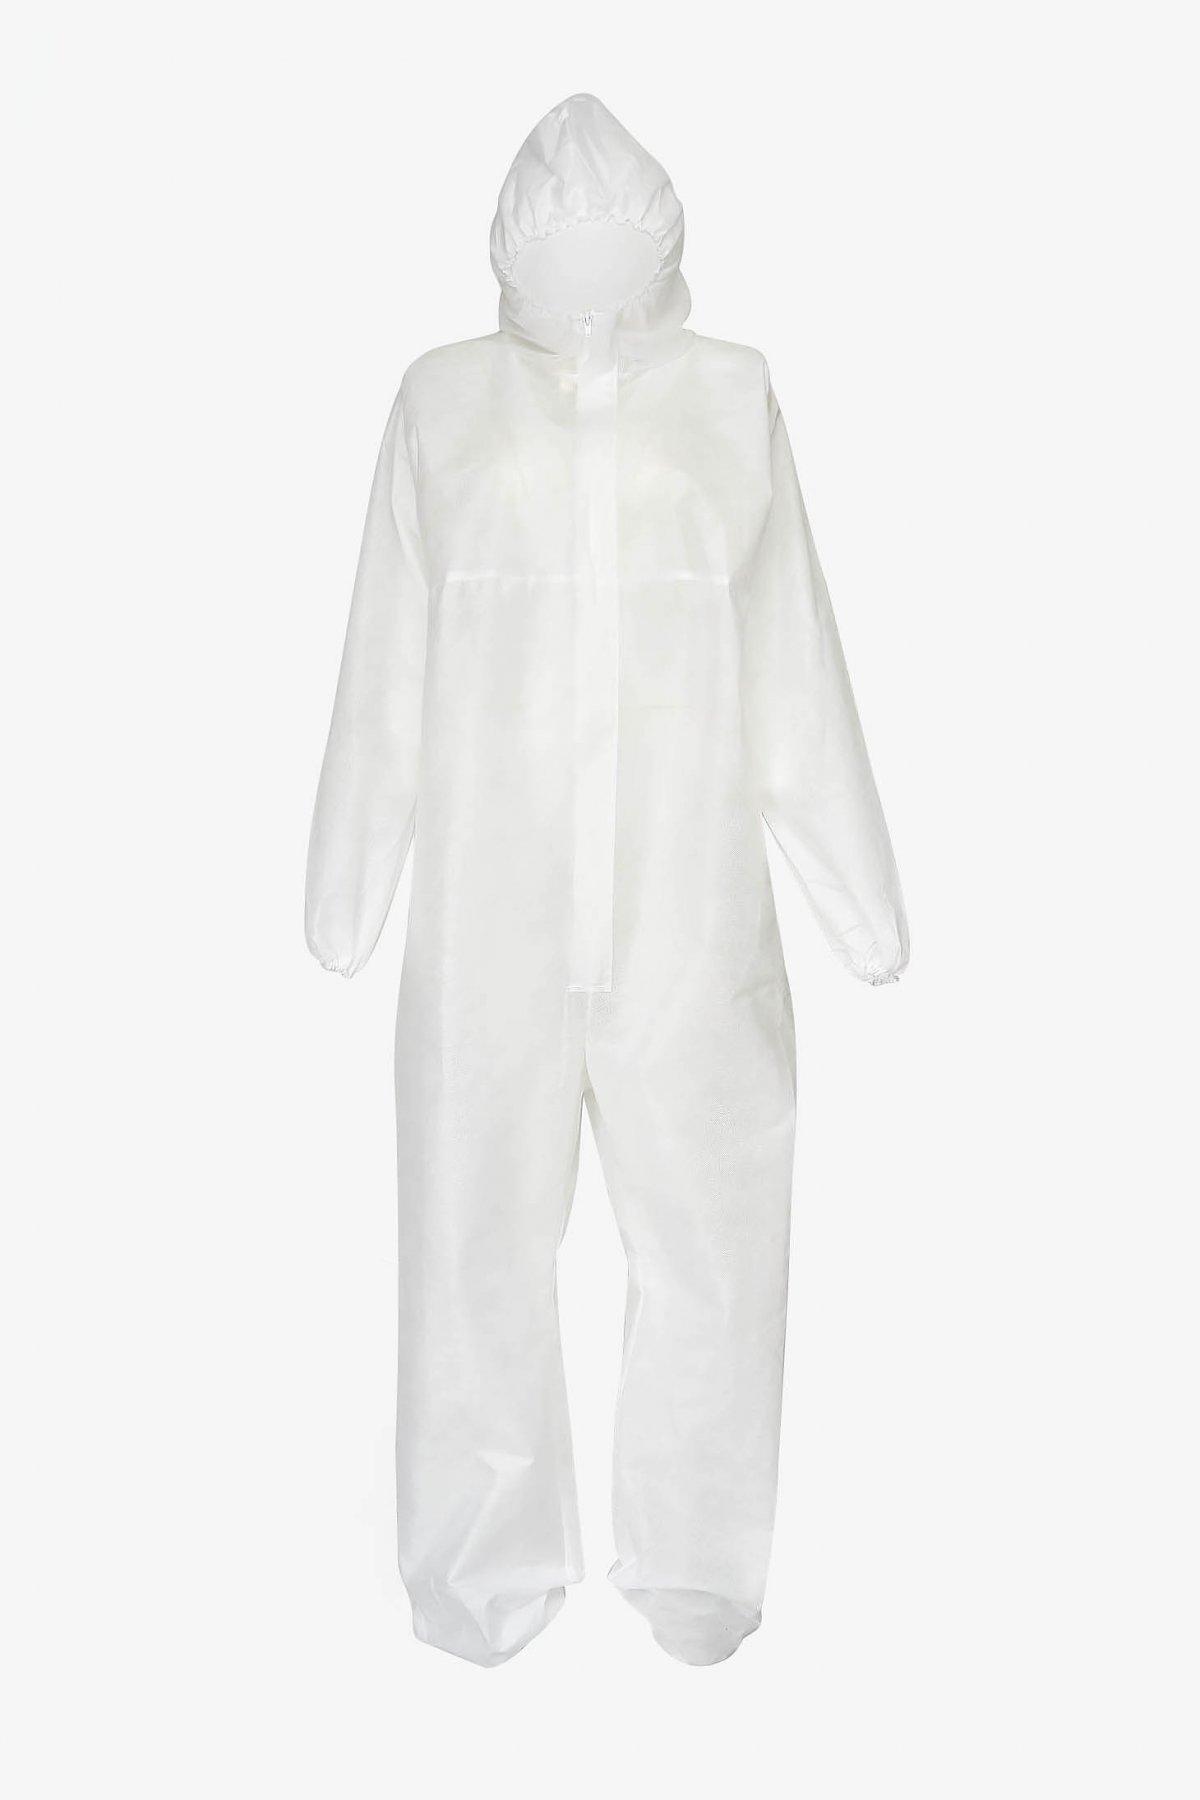 Combinezon alb engros la 26 lei + TVA COMANDA MINIMA 100 BUC din polipropilena imagine